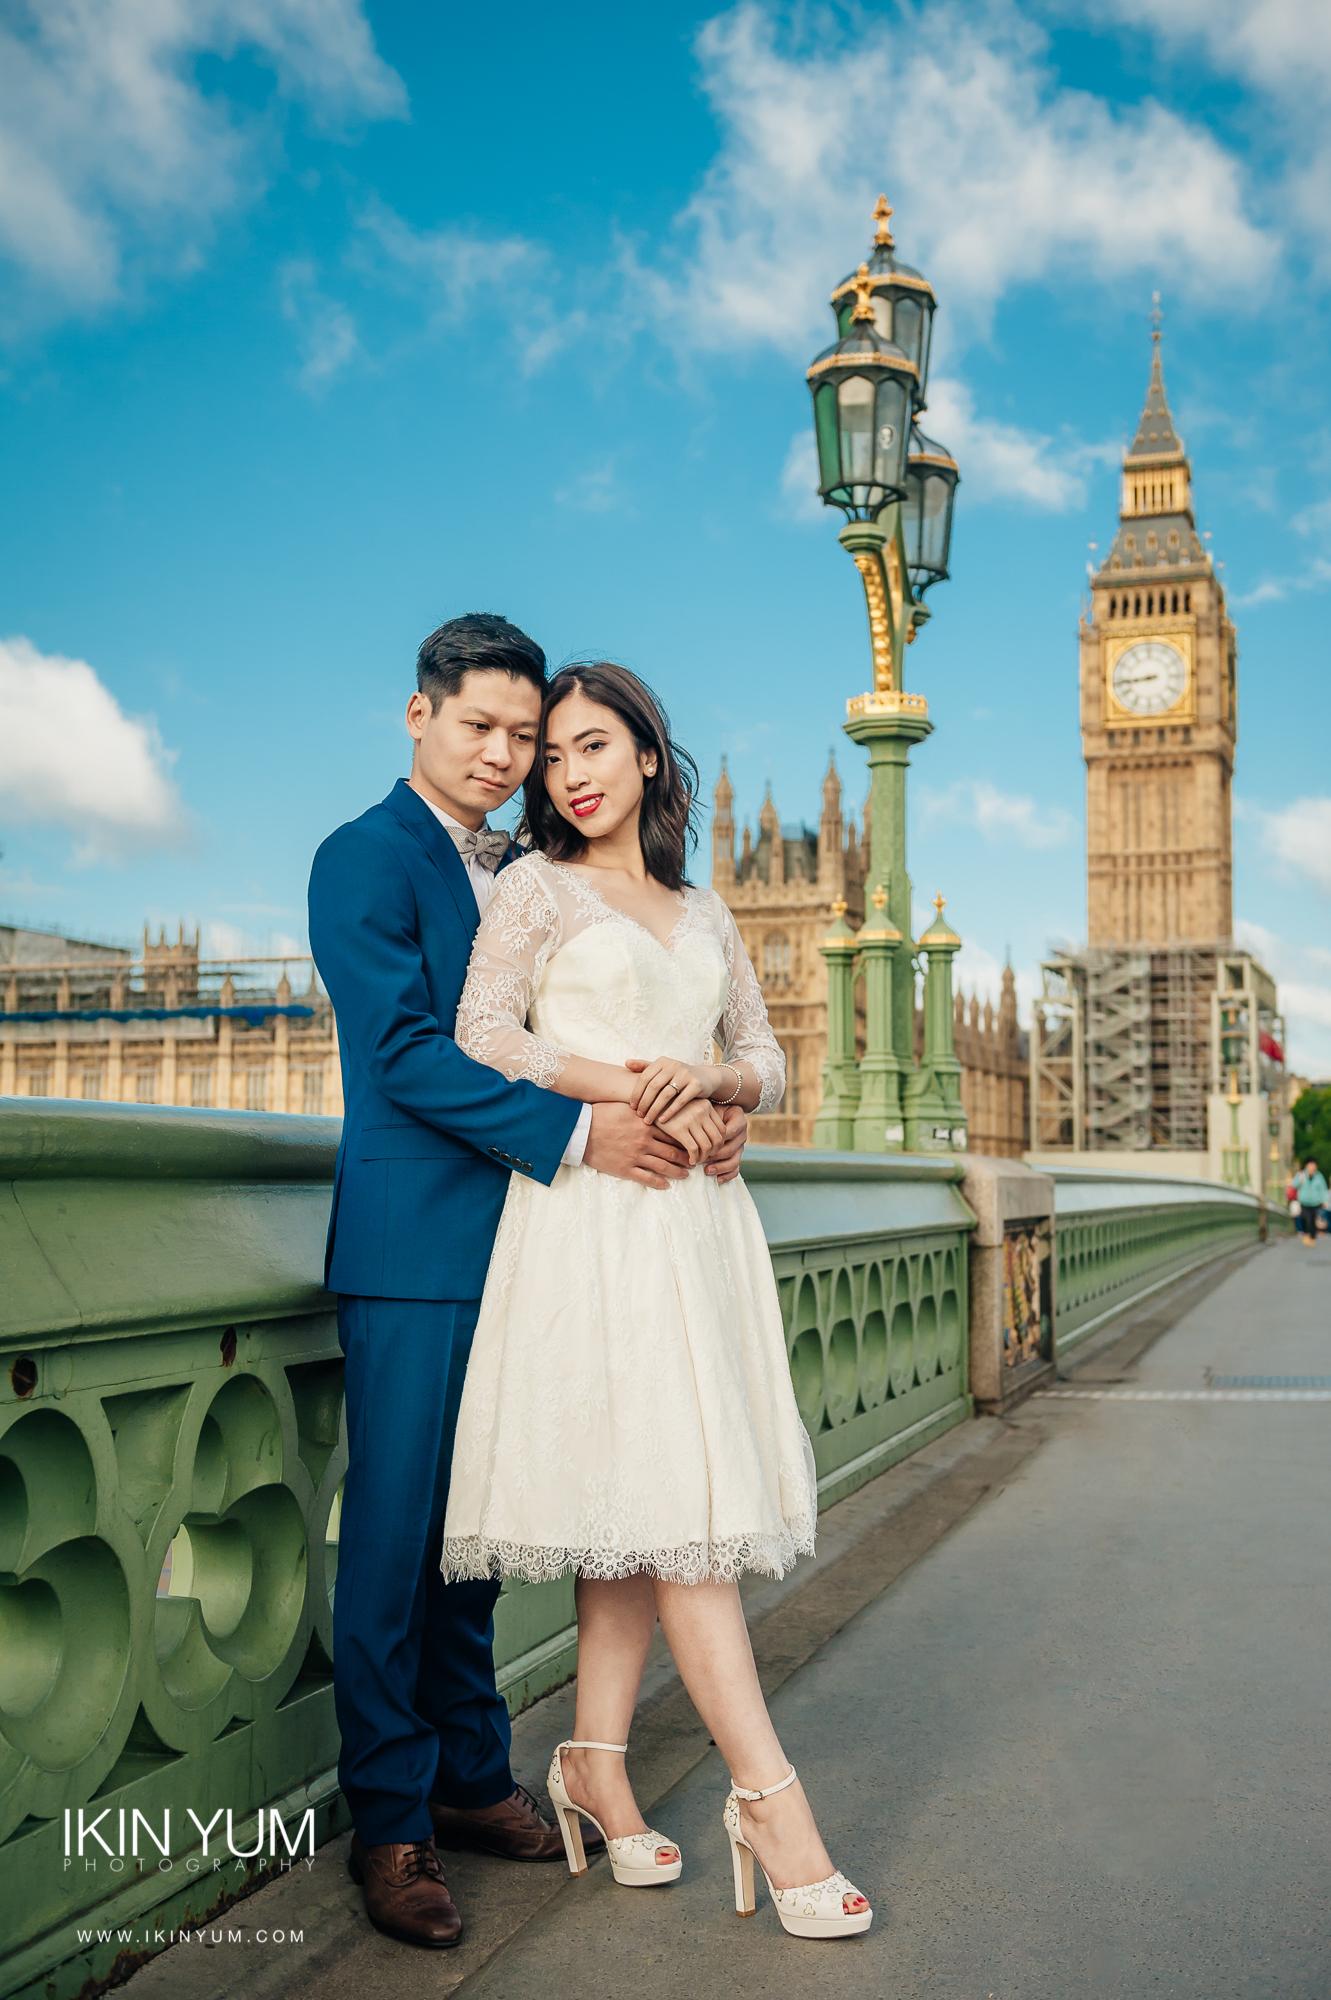 Natalie & Duncan Wedding Day - Ikin Yum Photography-033.jpg